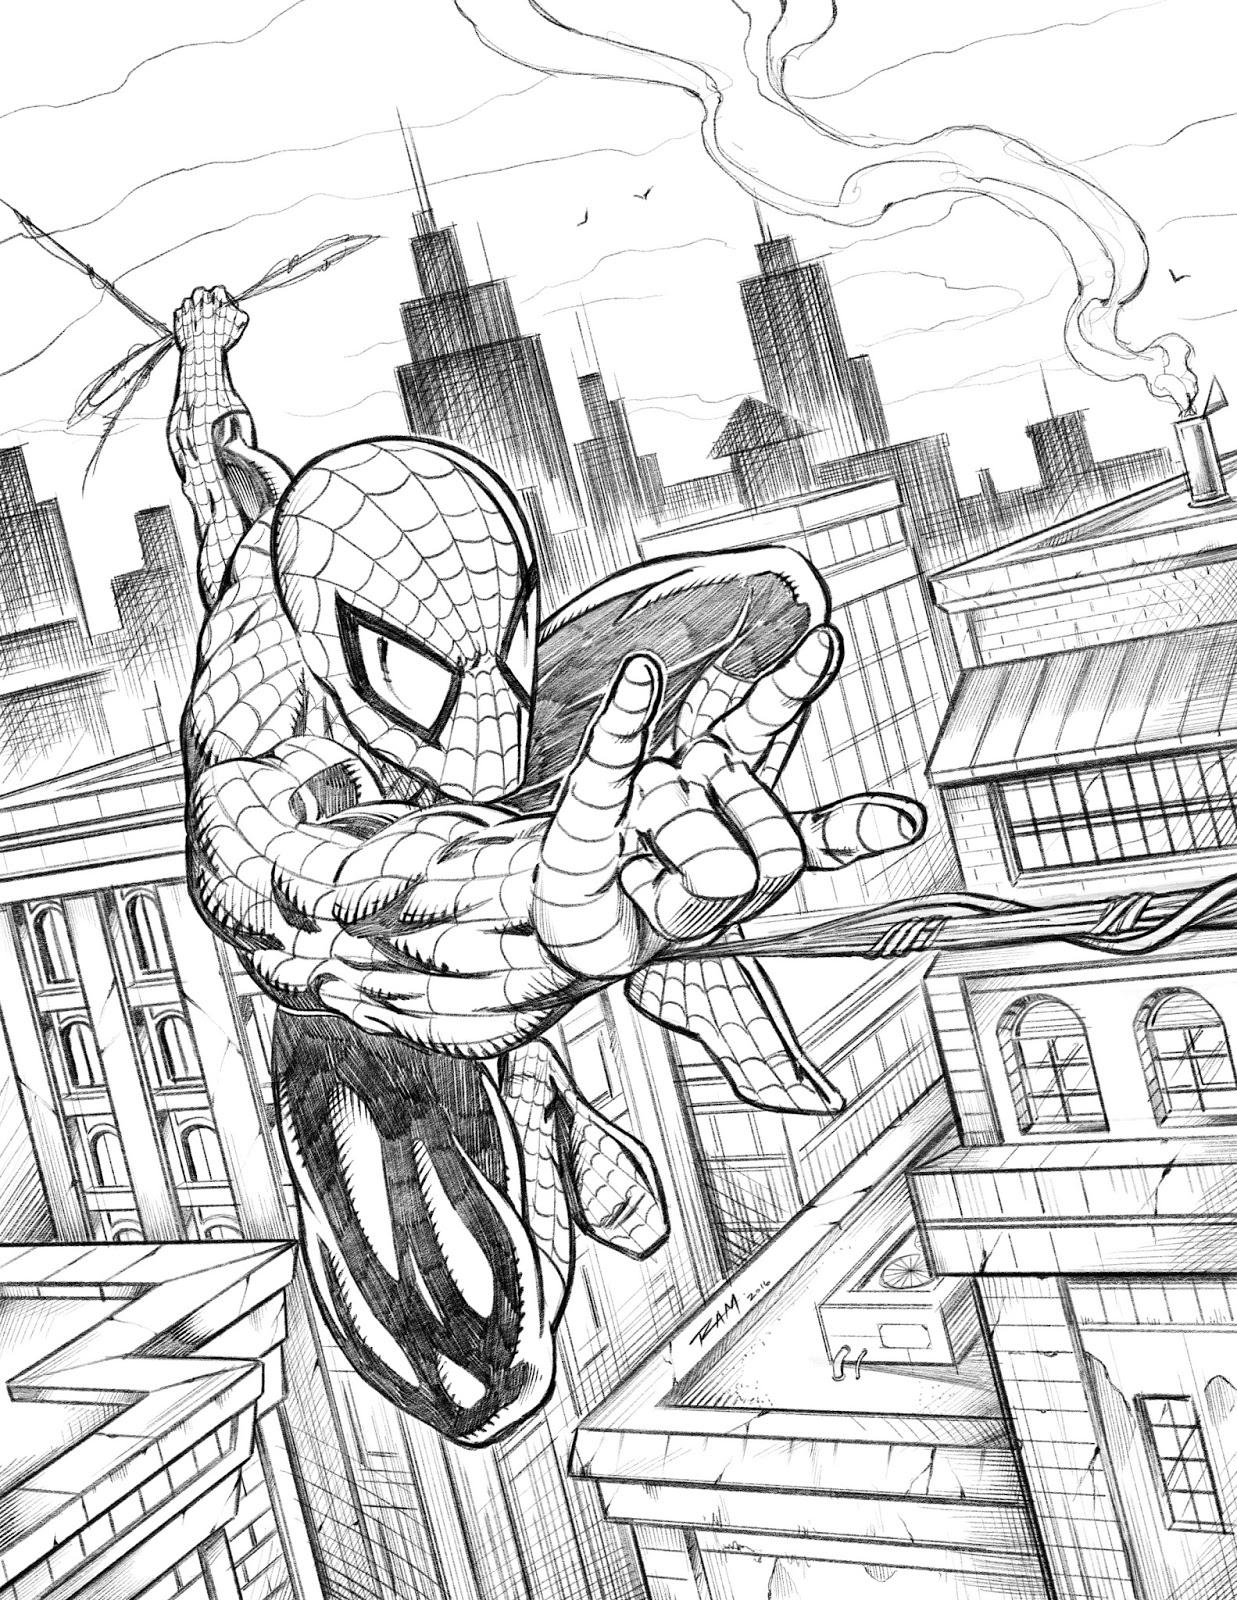 1237x1600 Ram Studios Comics Drawing Spider Man On The Ipad Pro In Procreate